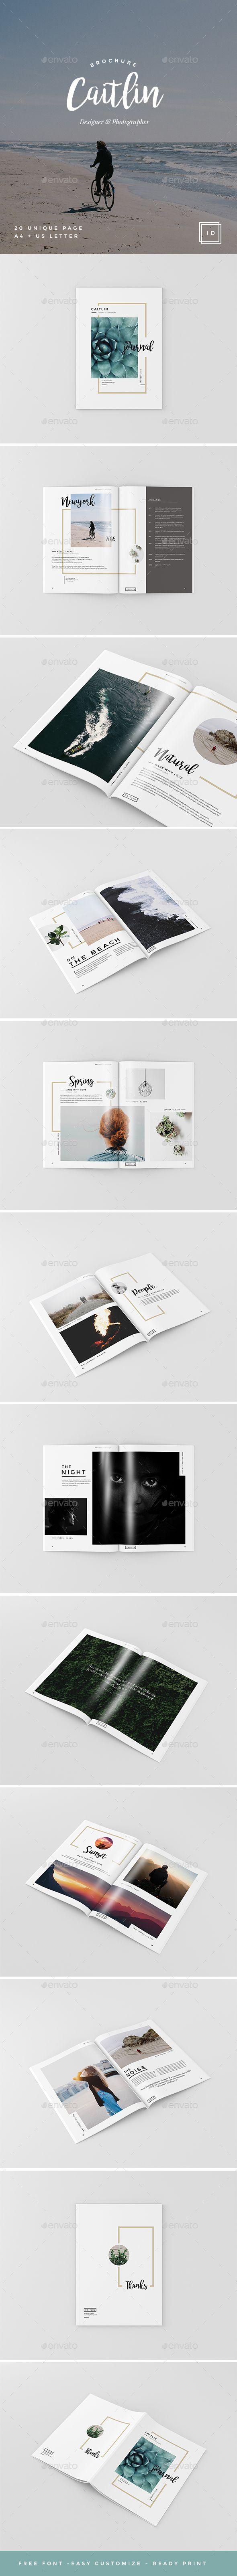 Caitlin - Creative Portfolio, Photography Brochure Template InDesign INDD. Download here: https://graphicriver.net/item/caitlin-creative-portfolio-photography-brochure/17264851?ref=ksioks